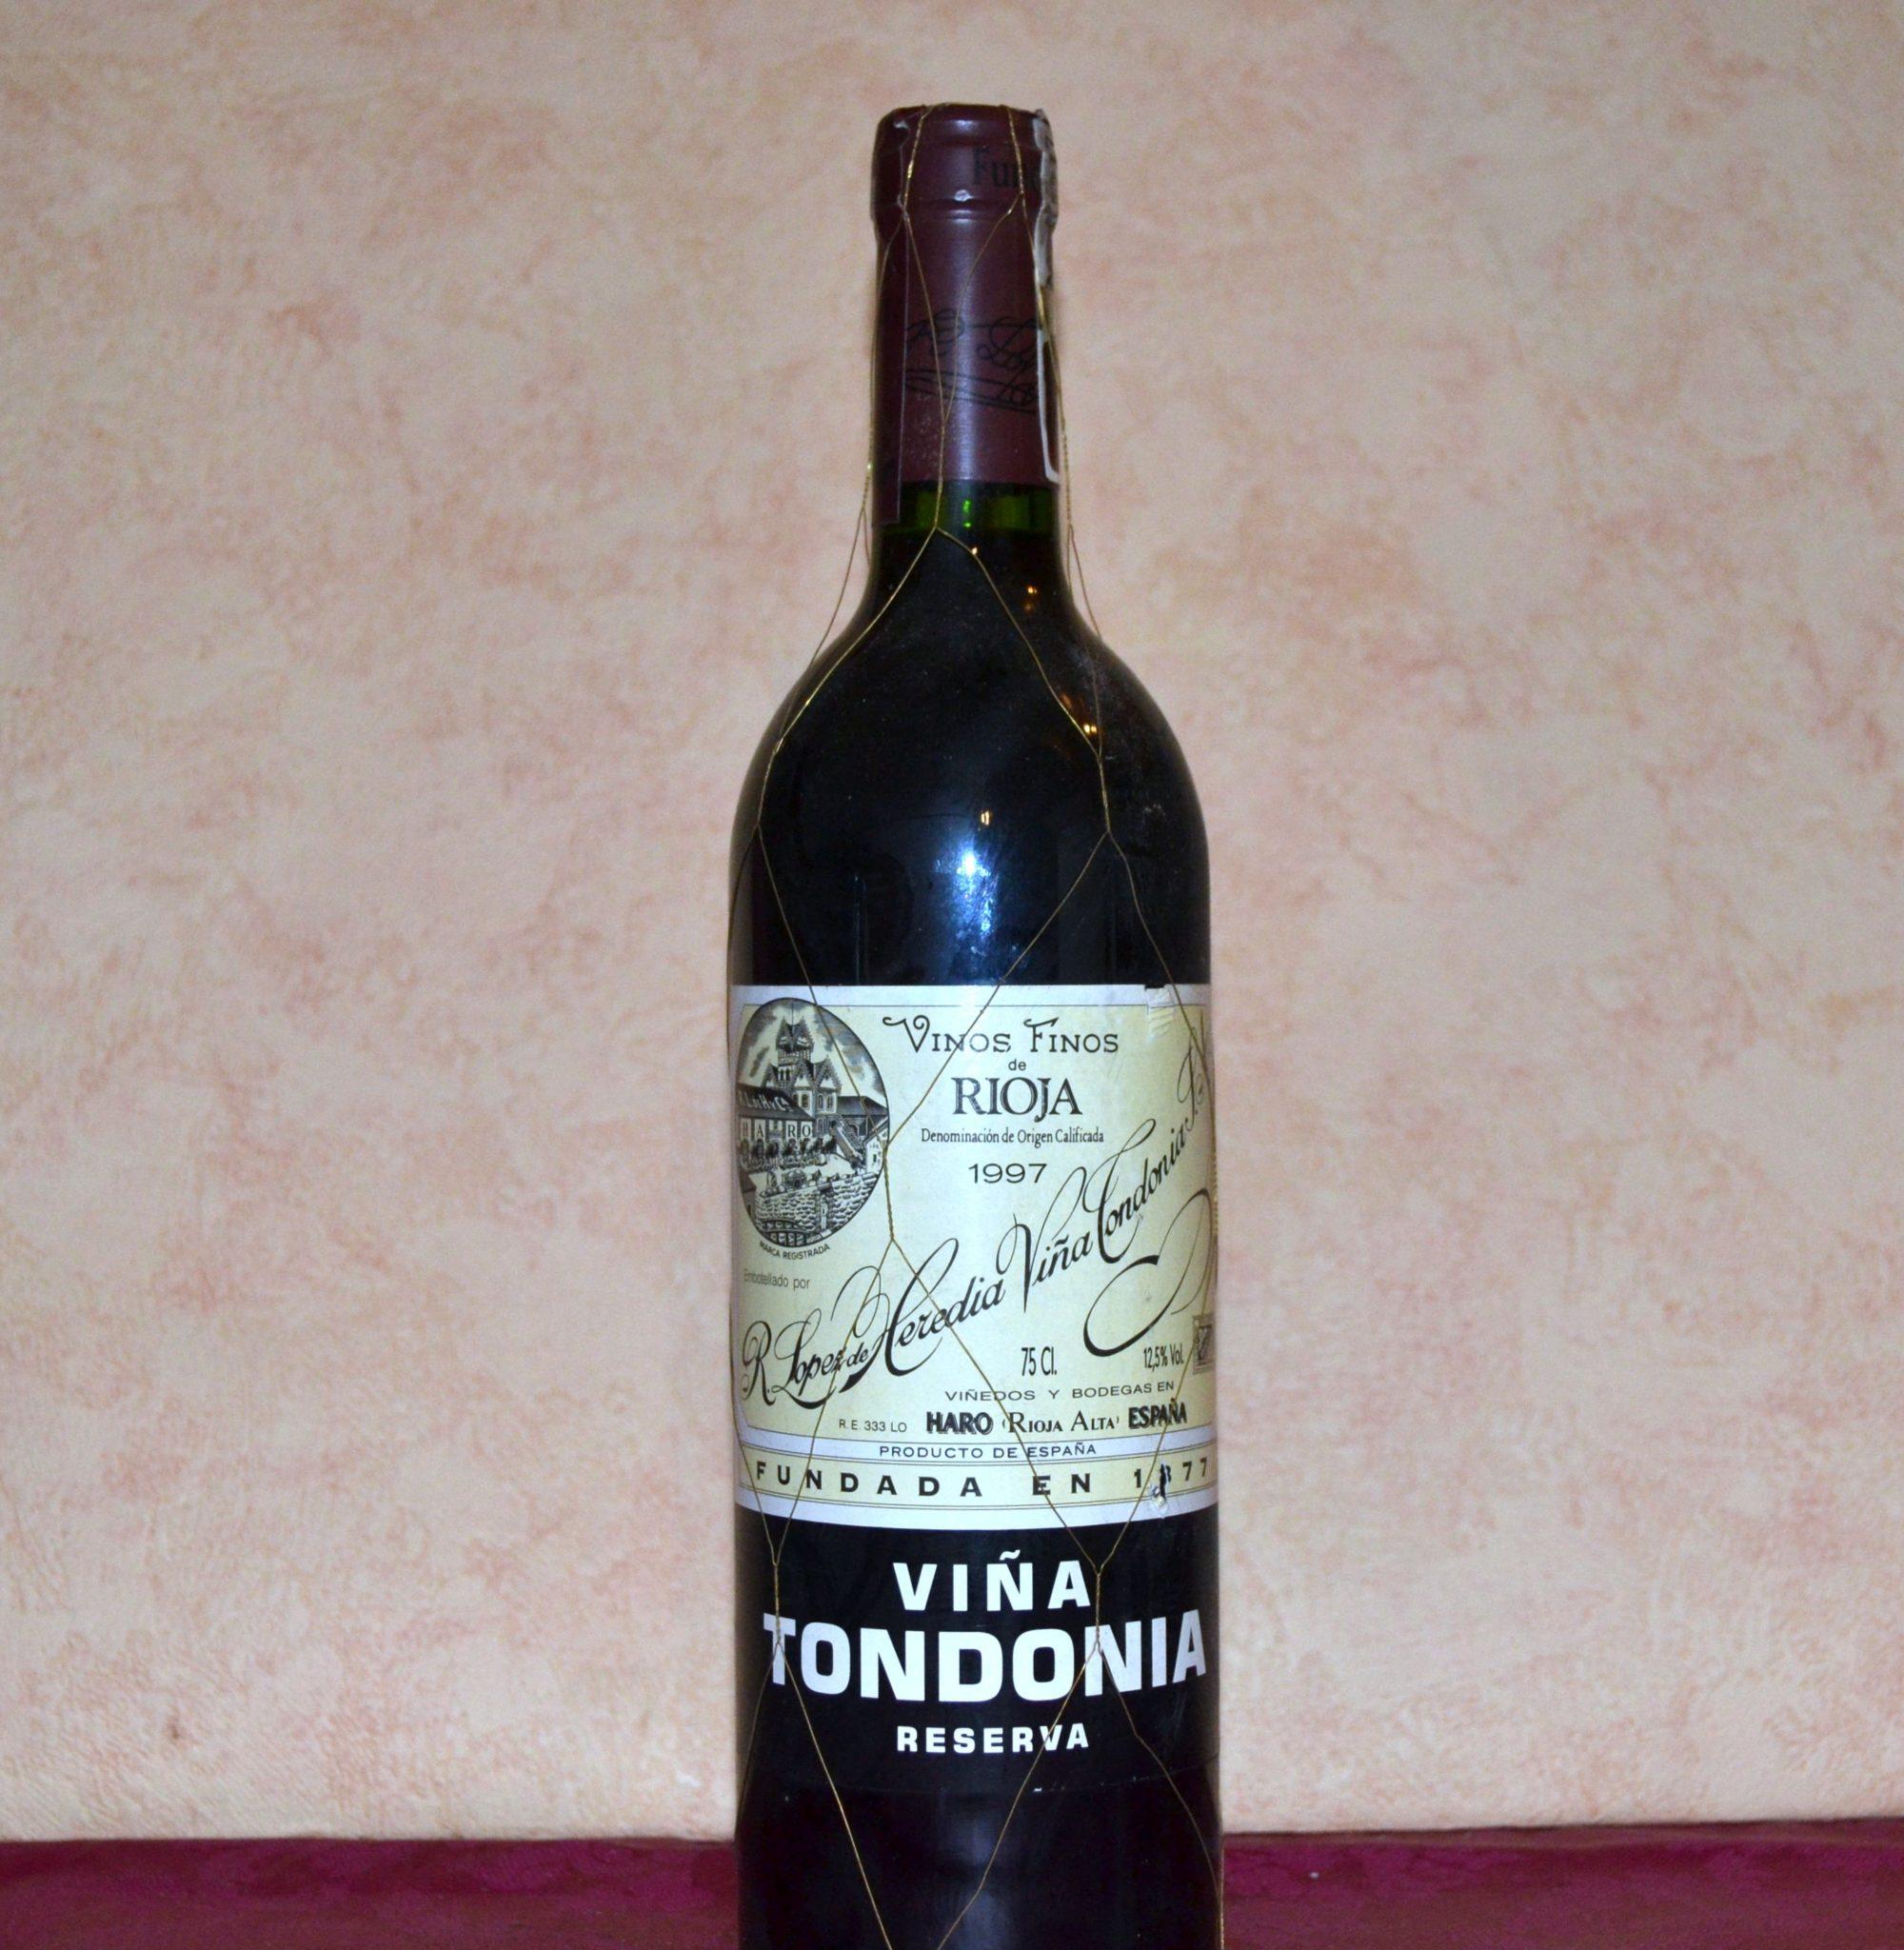 VIÑA TONDONIA BODEGAS LOPEZ HEREDIA RESERVA 1997